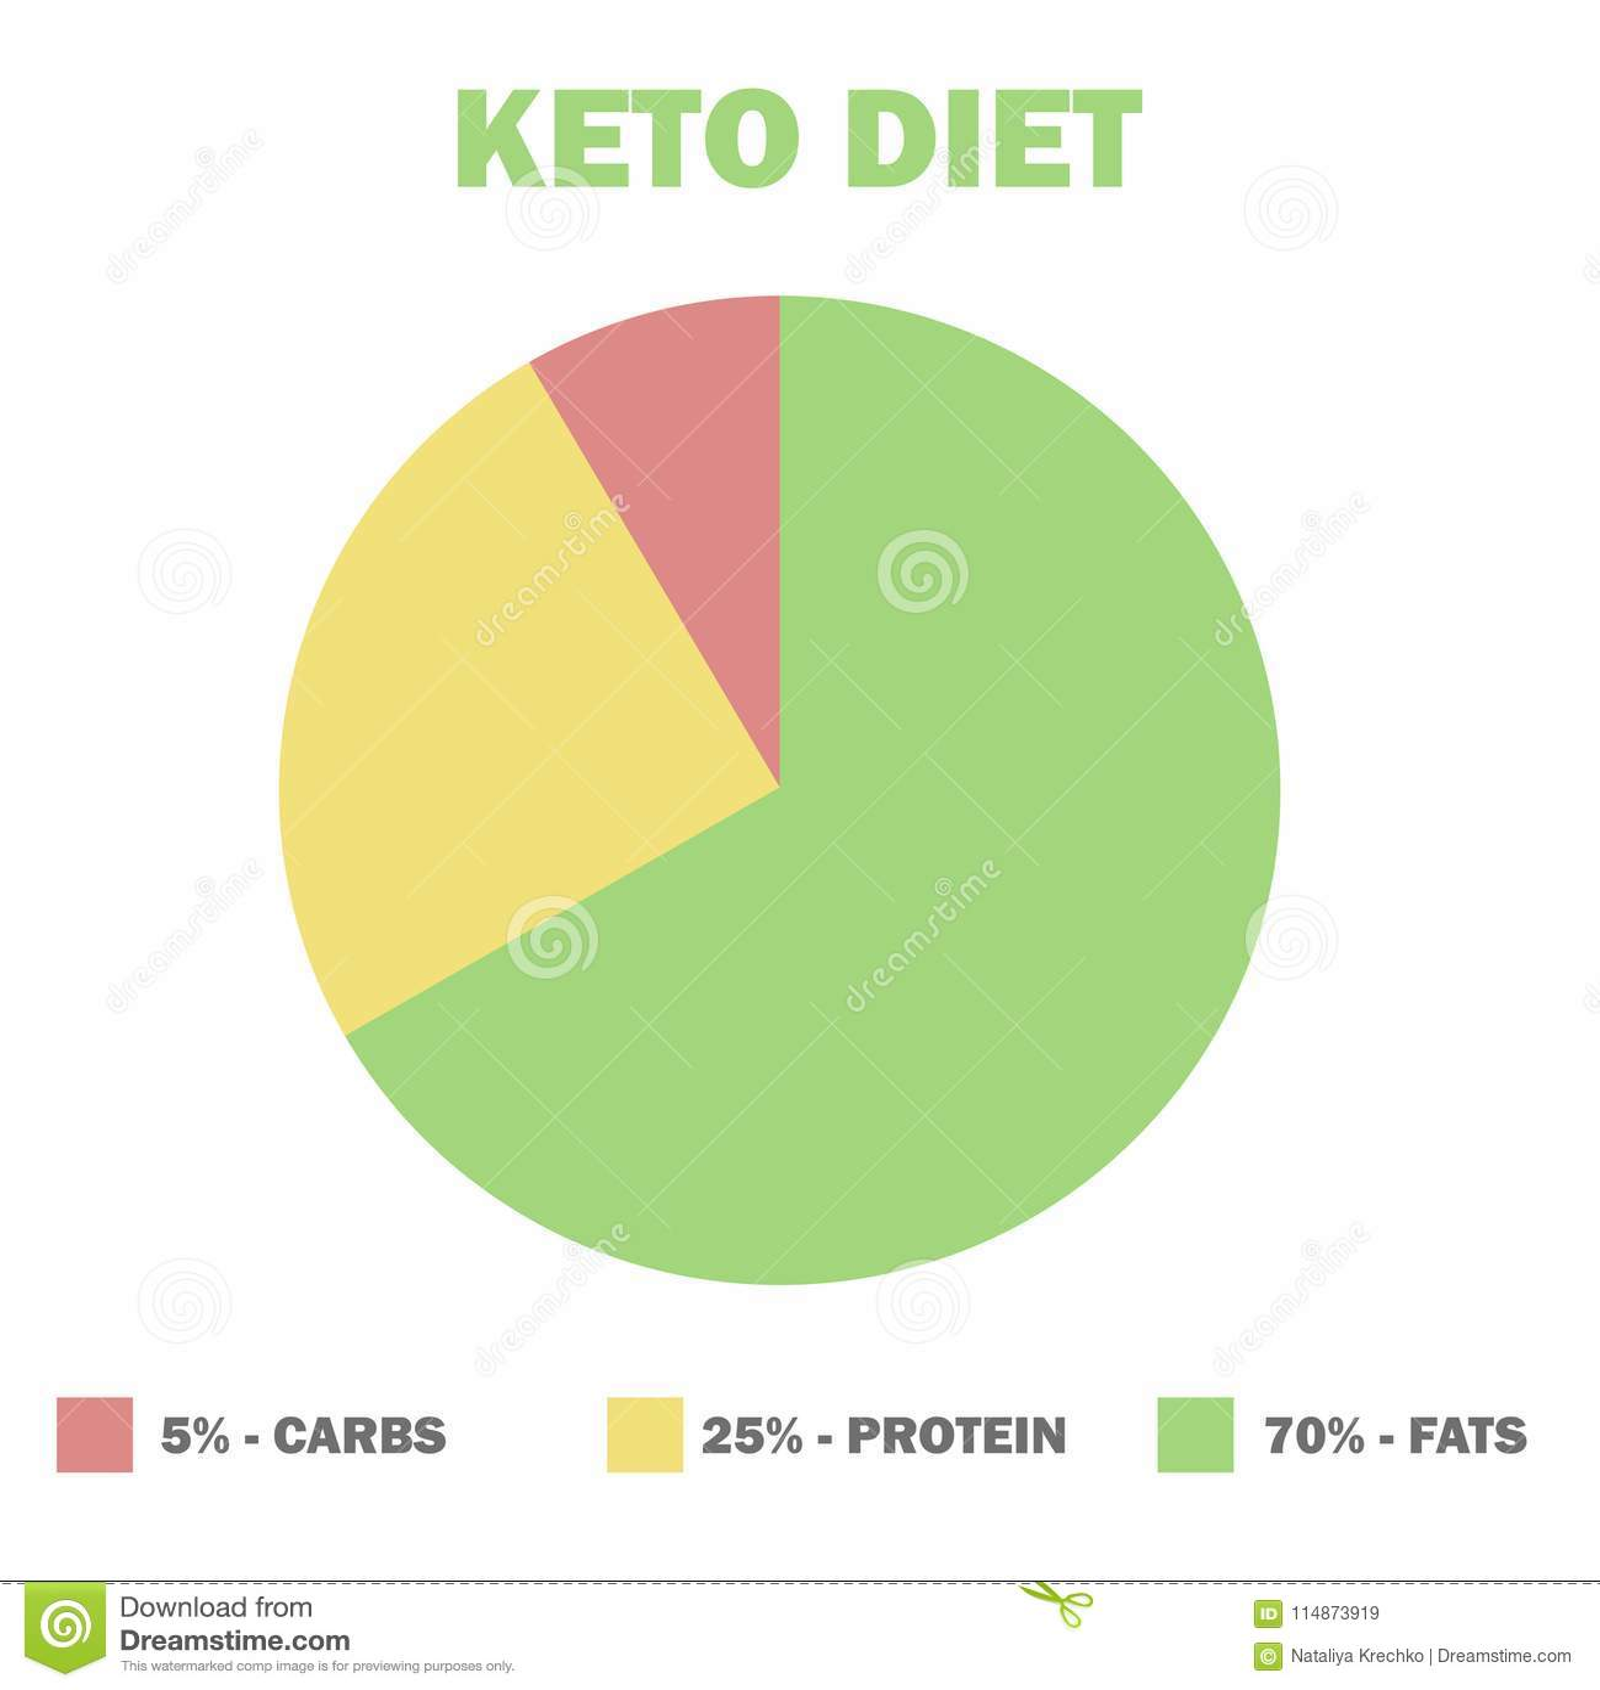 ketogenic diet macros diagram, low carbs, high healthy fat stock  ketogenic diet macros diagram, low carbs, high healthy fat